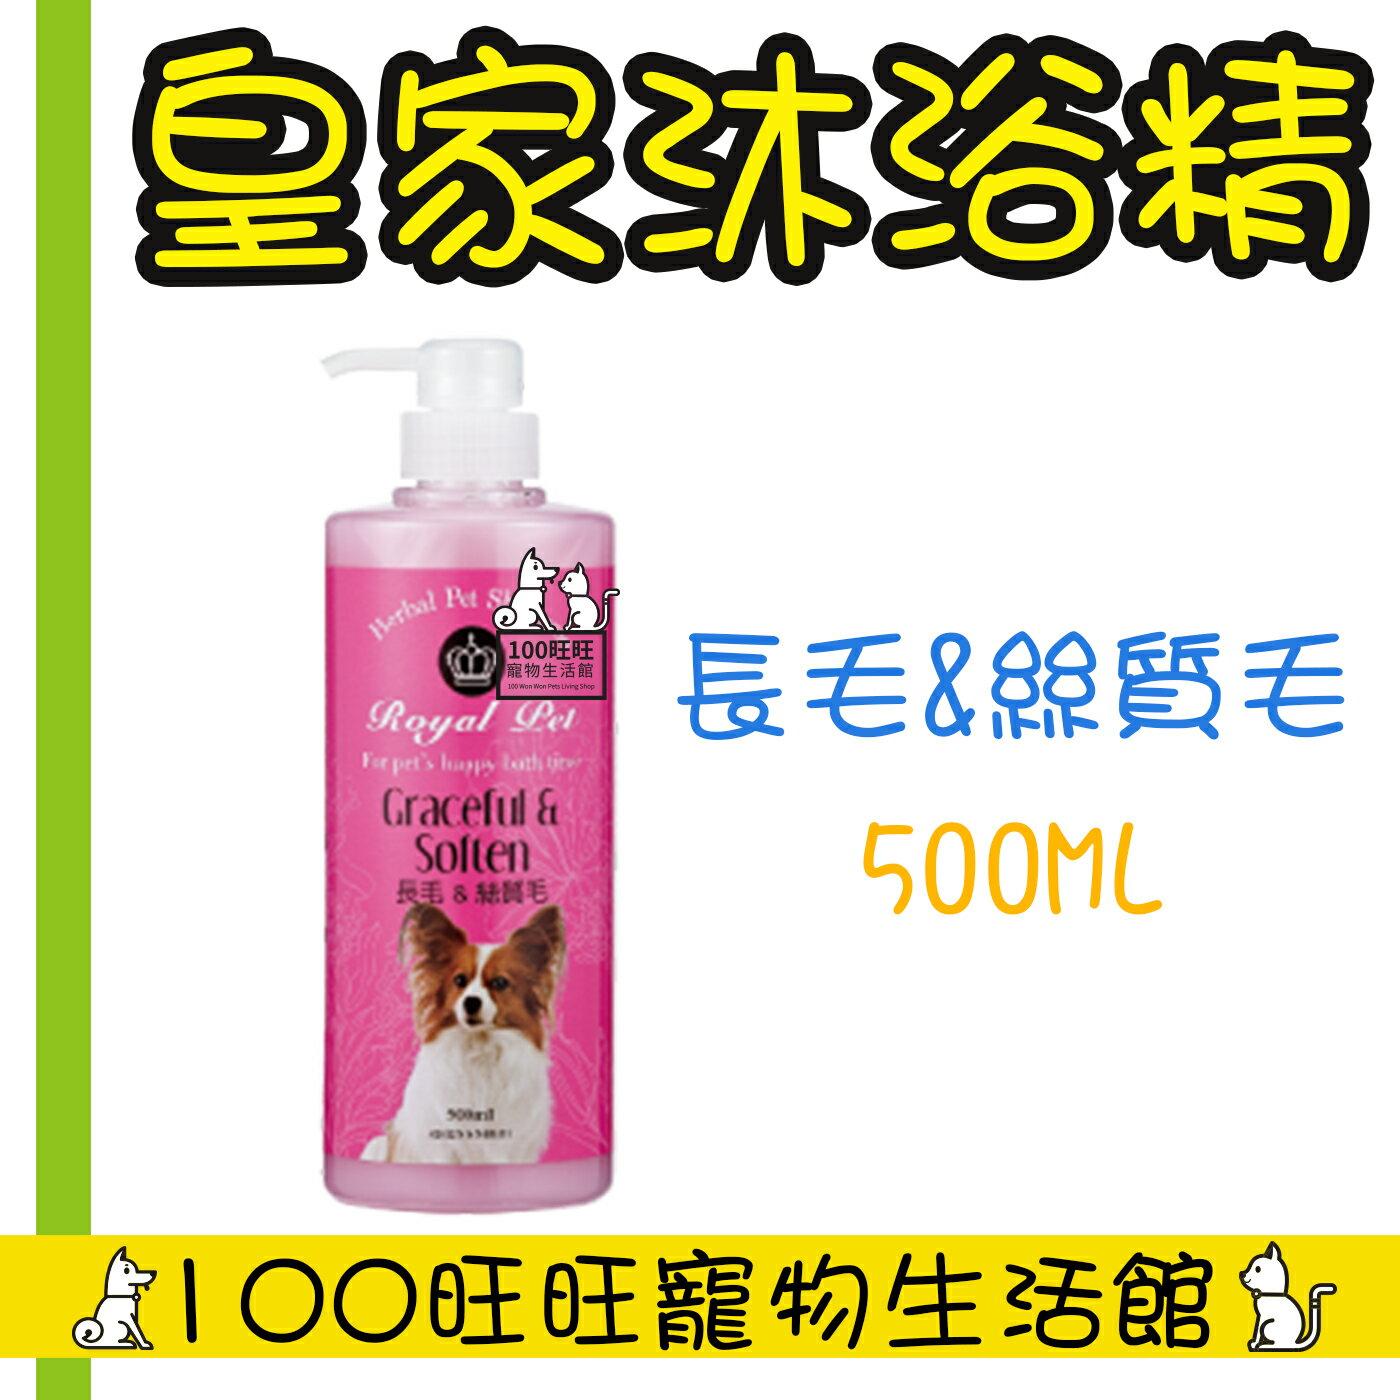 Royal Pet皇家系列 皇家沐浴精 長毛&絲質毛 500ml 寵物洗毛精